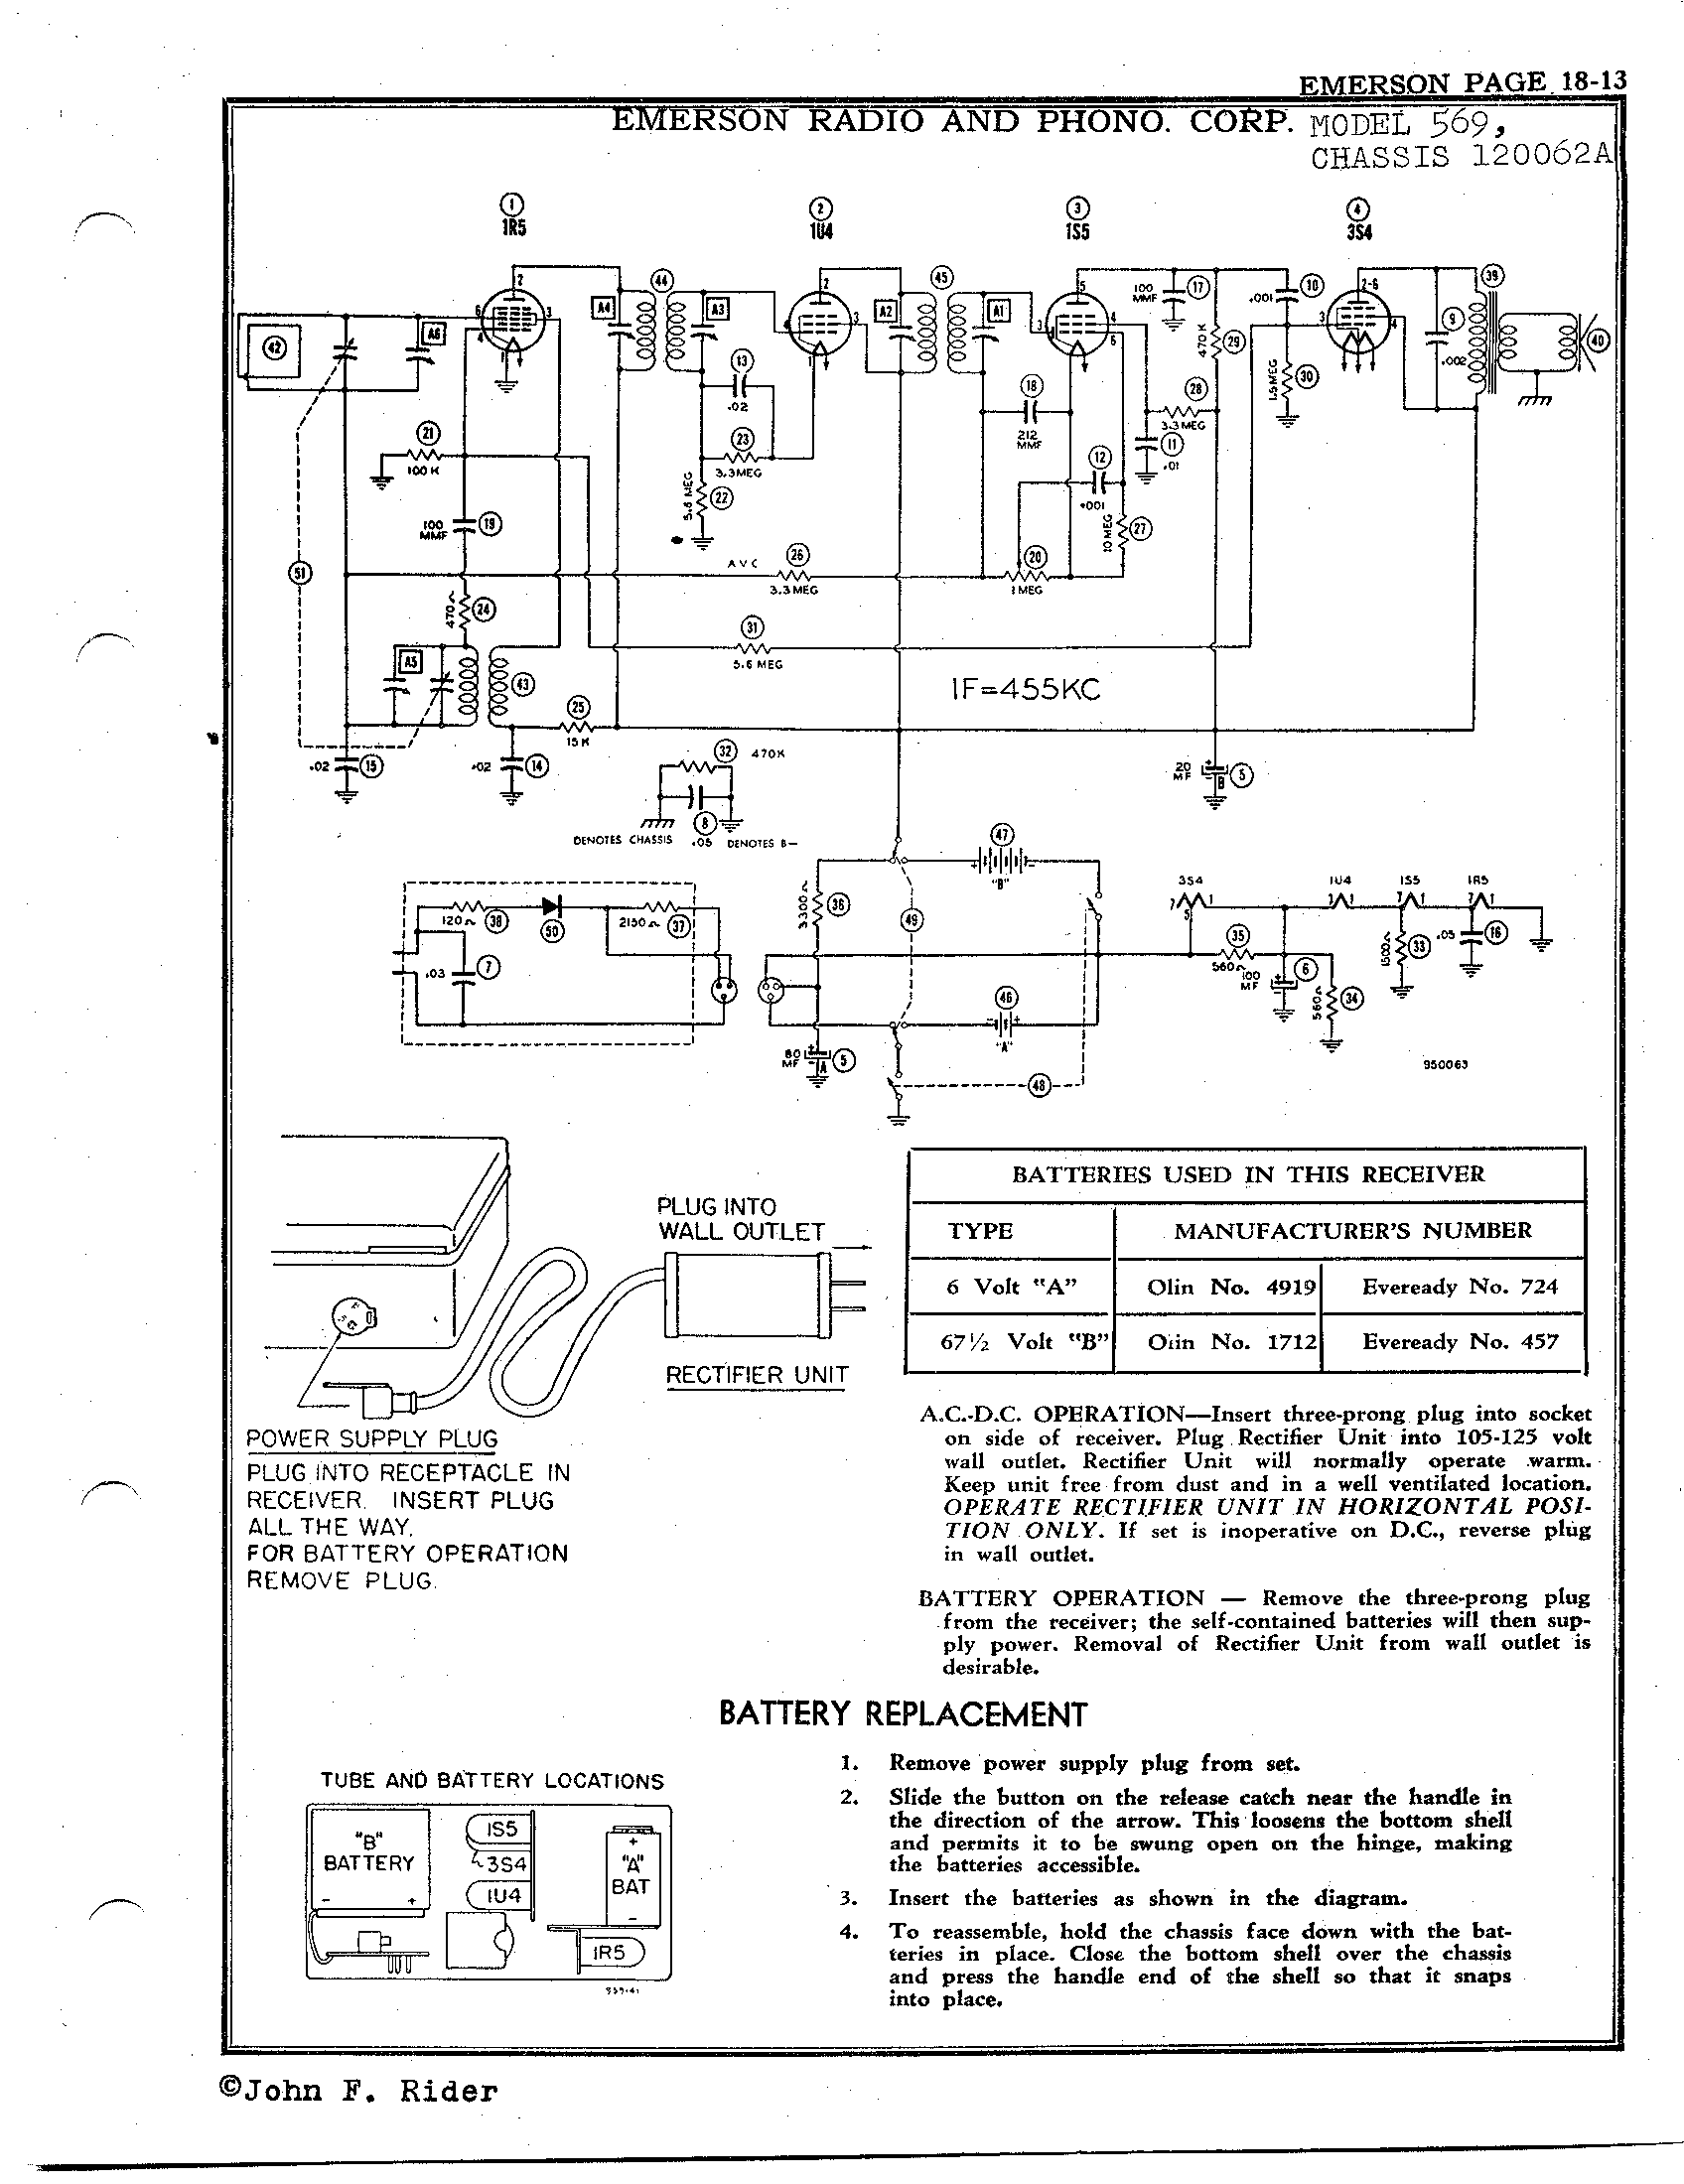 Emerson Radio   Phonograph Corp 569   Antique Electronic